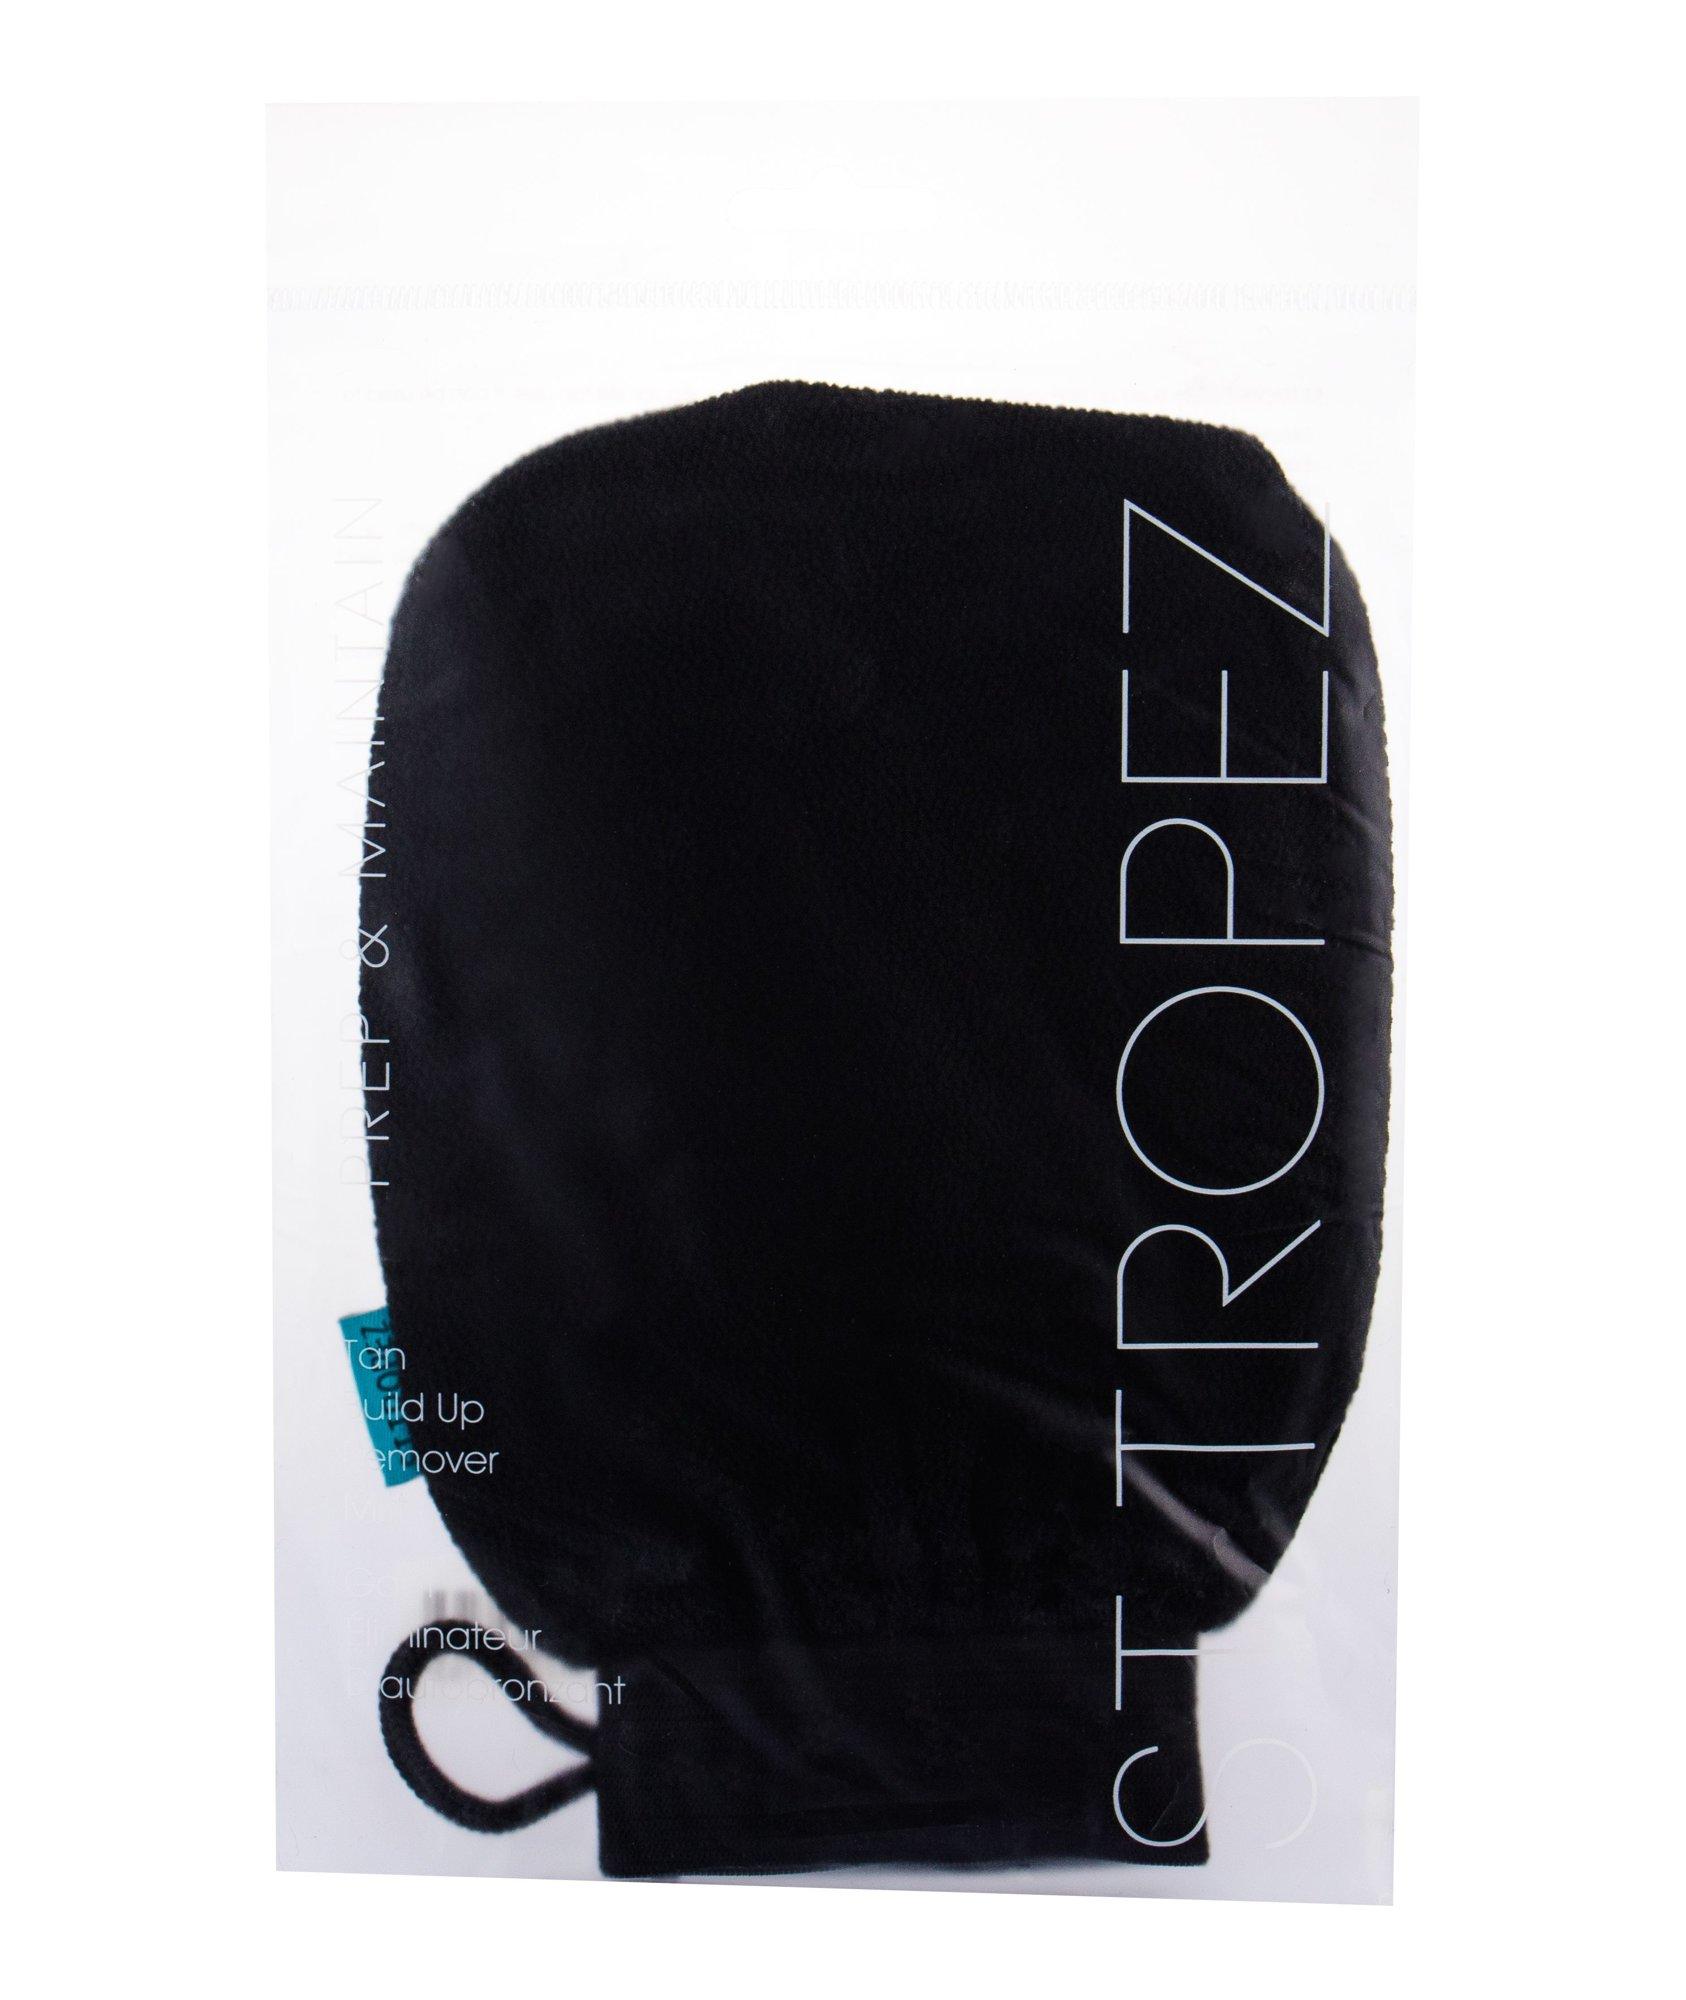 St.Tropez Prep & Maintain Sun Body Lotion 1ml  Tan Build Up Remover Mitt